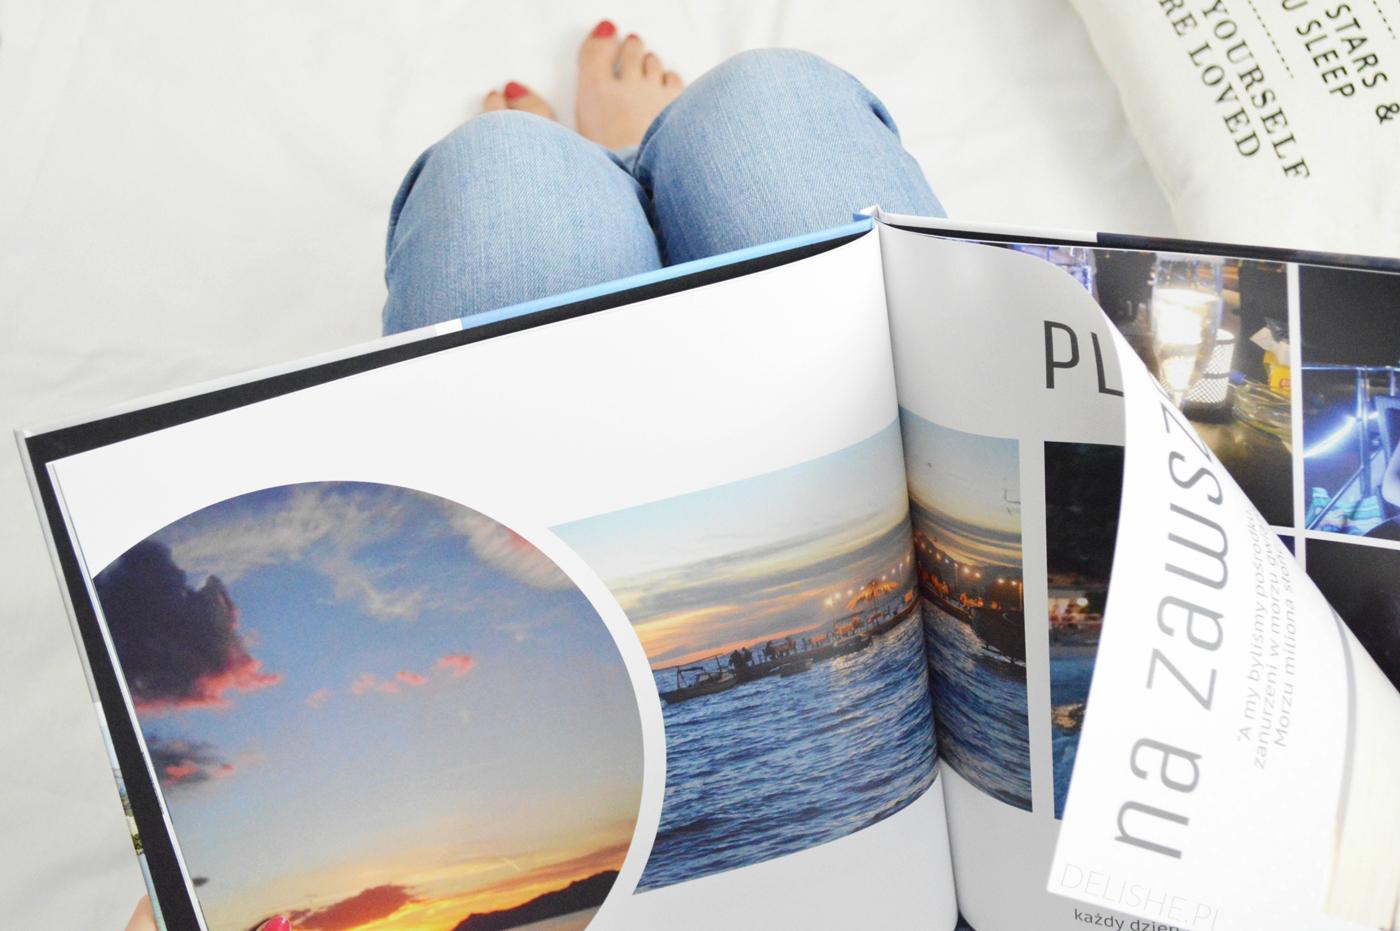 fotoksiążka printu pomysł na prezent blog